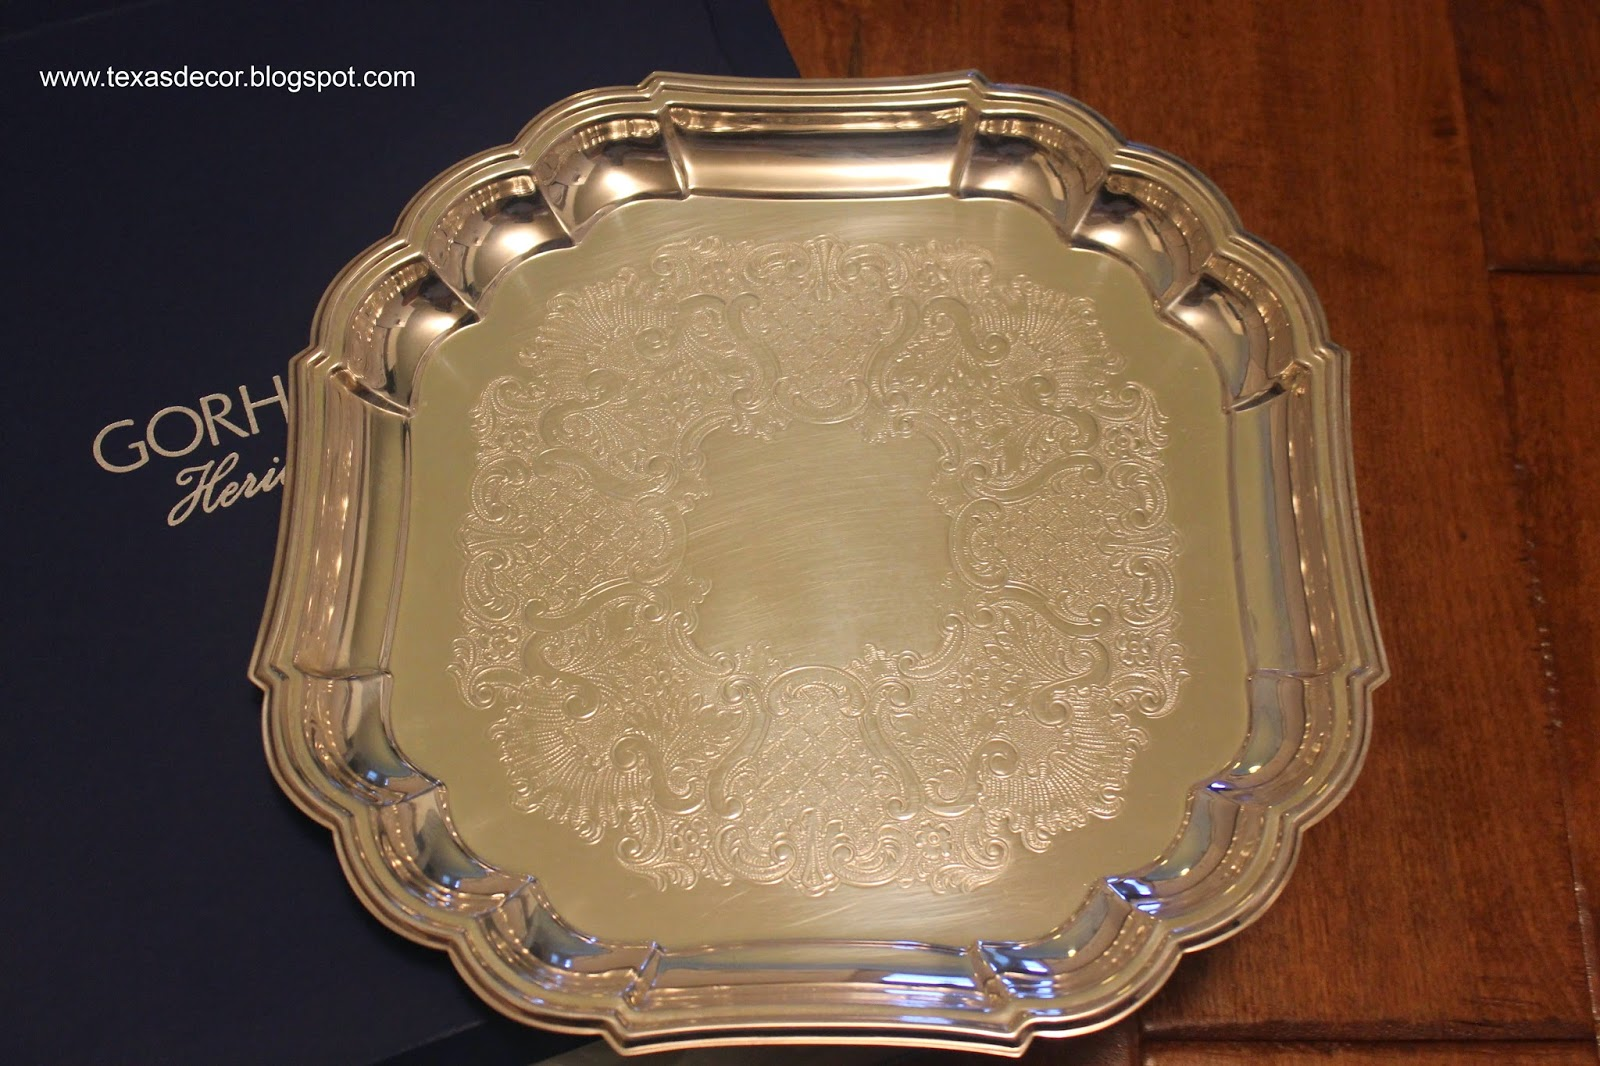 gorham silver platter circa 1990